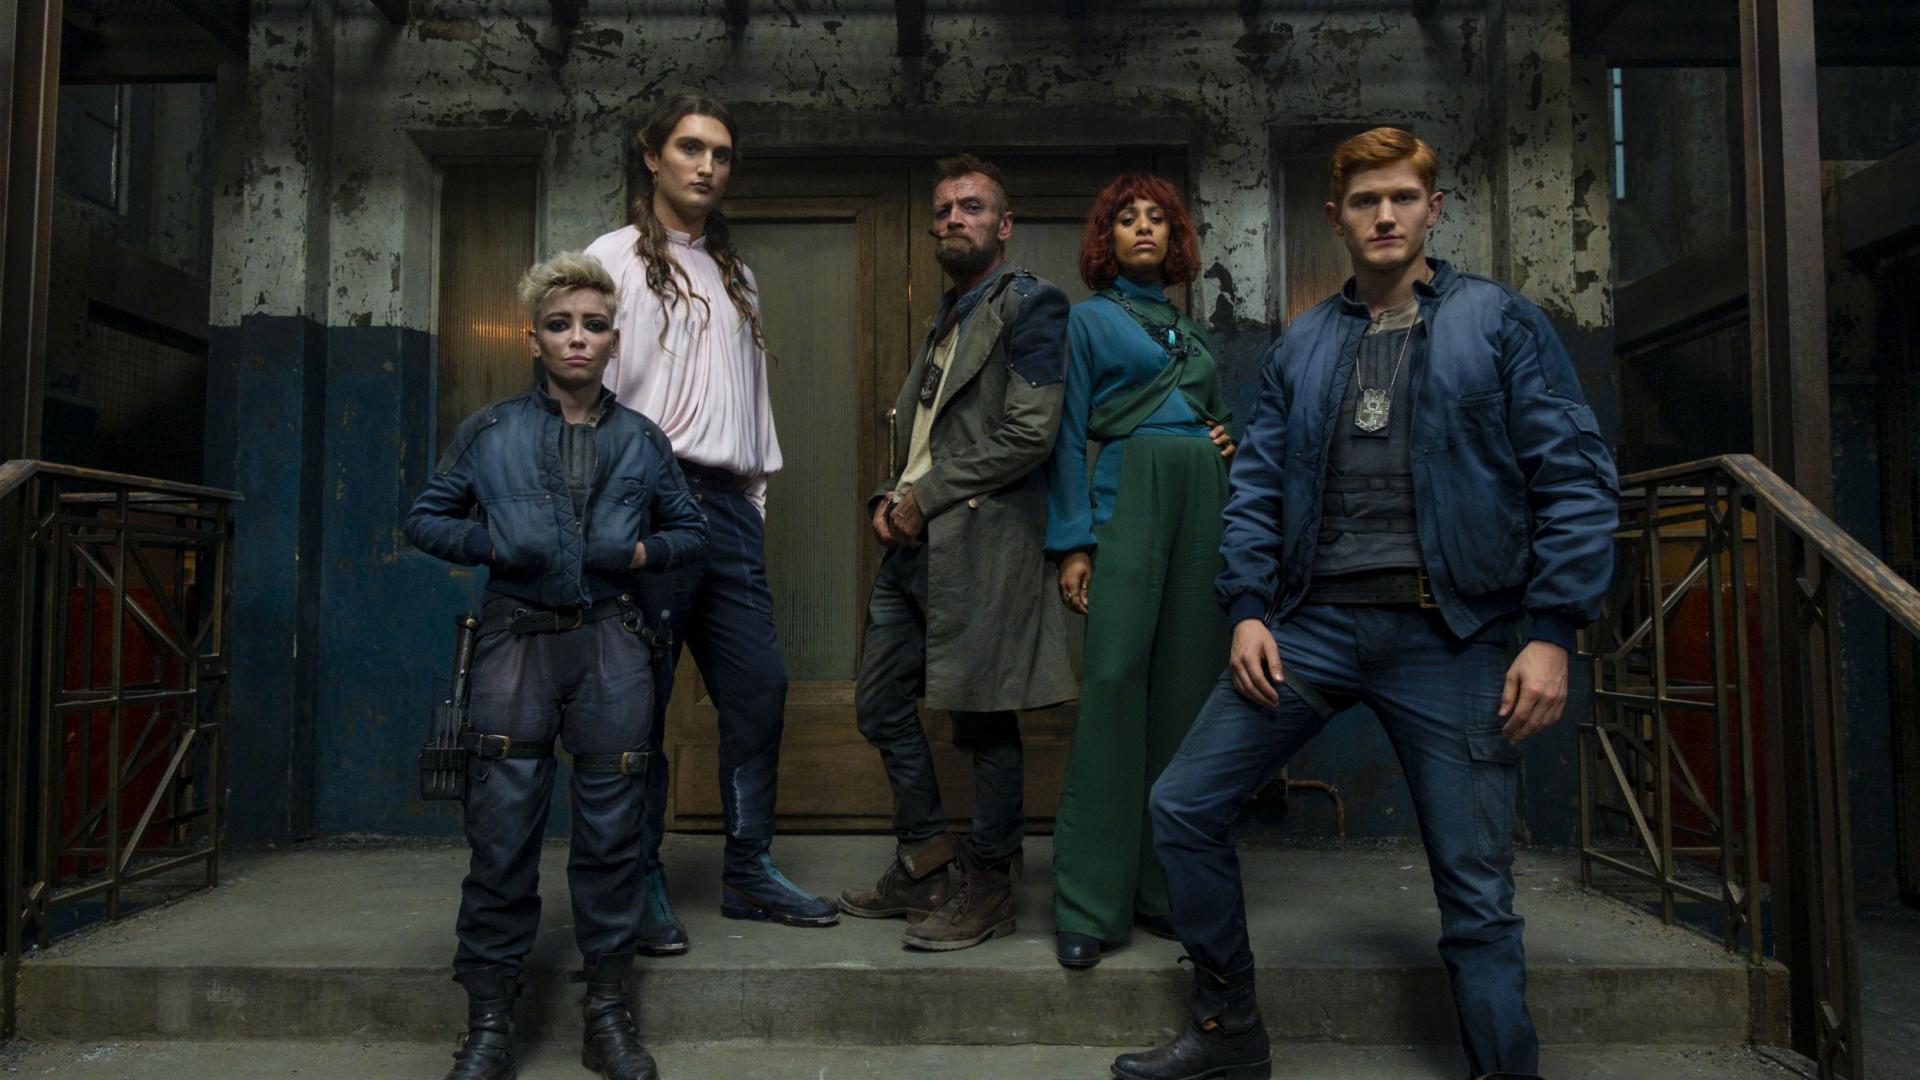 Corporal Angua von Uberwald (Marama Corlett), Corporal Cheery (Jo Eaton-Kent), Captain Sam Vimes (Richard Dormer), Lady Sybil Ramkin (Lara Rossi) and Corporal Carrot Ironfoundersson (Adam Hugill) in The Watch (2020)